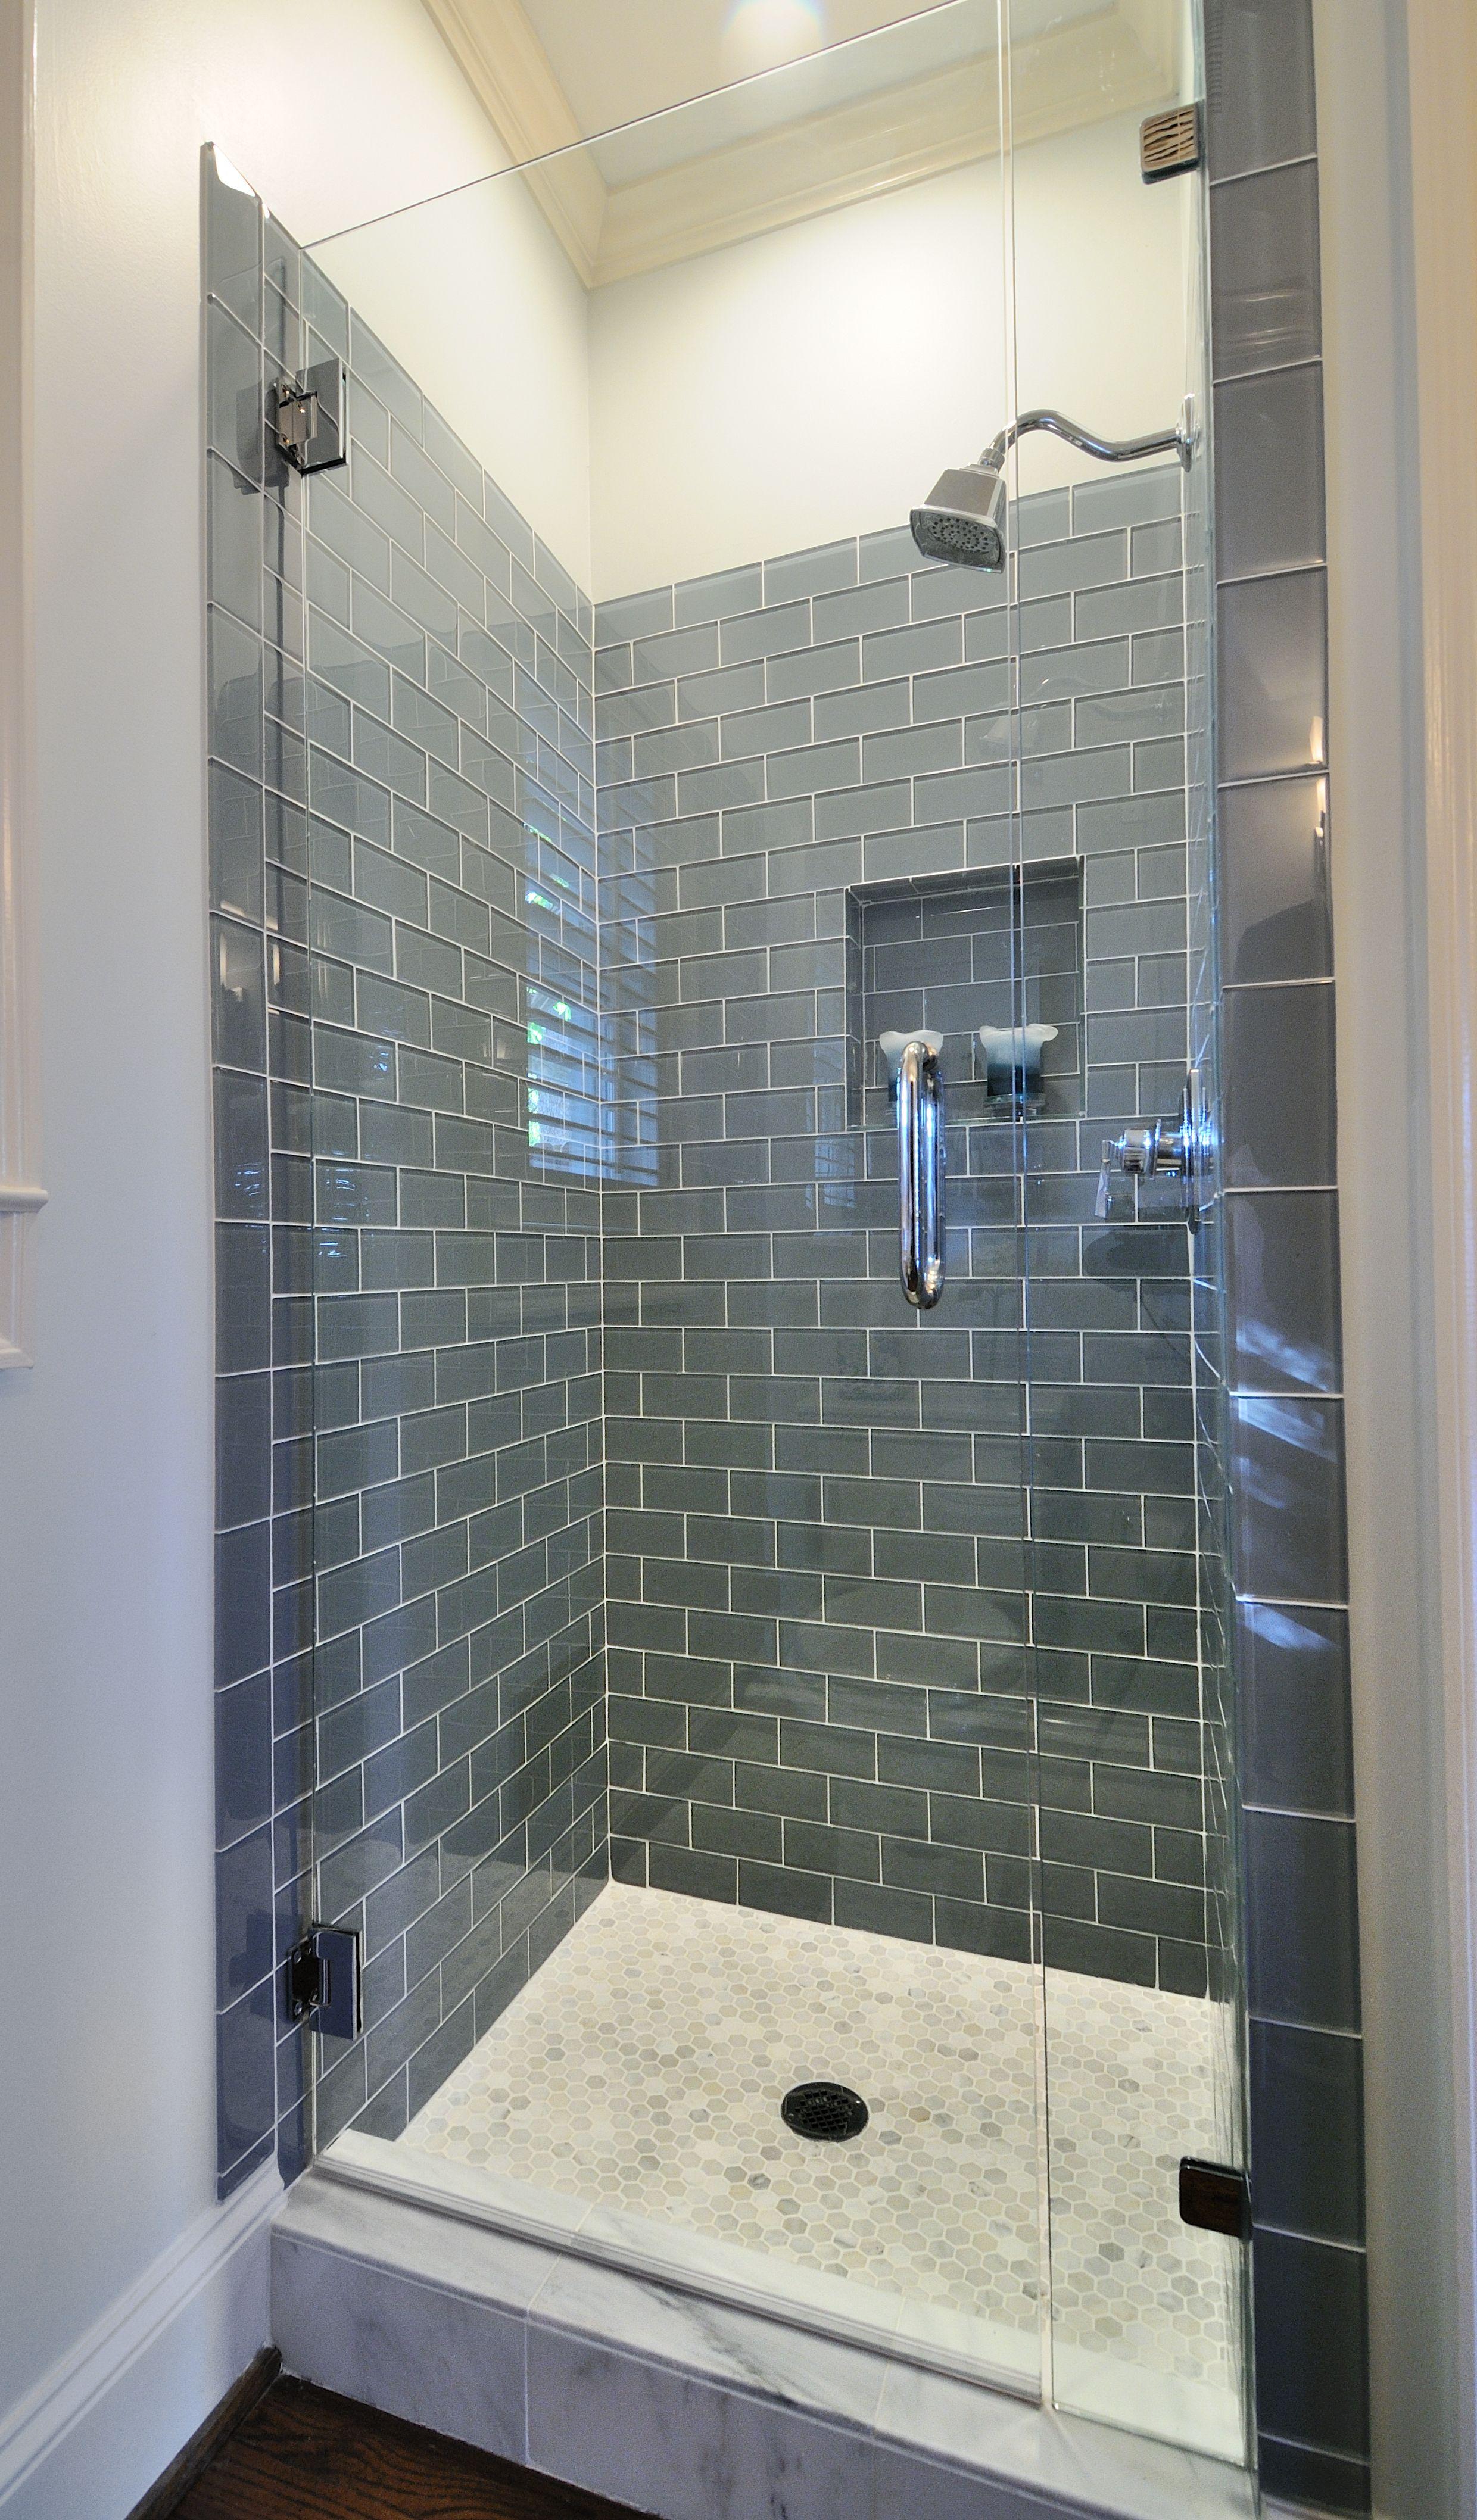 Ice Gray Glass Subway Tile | Tile and flooring | Pinterest ...